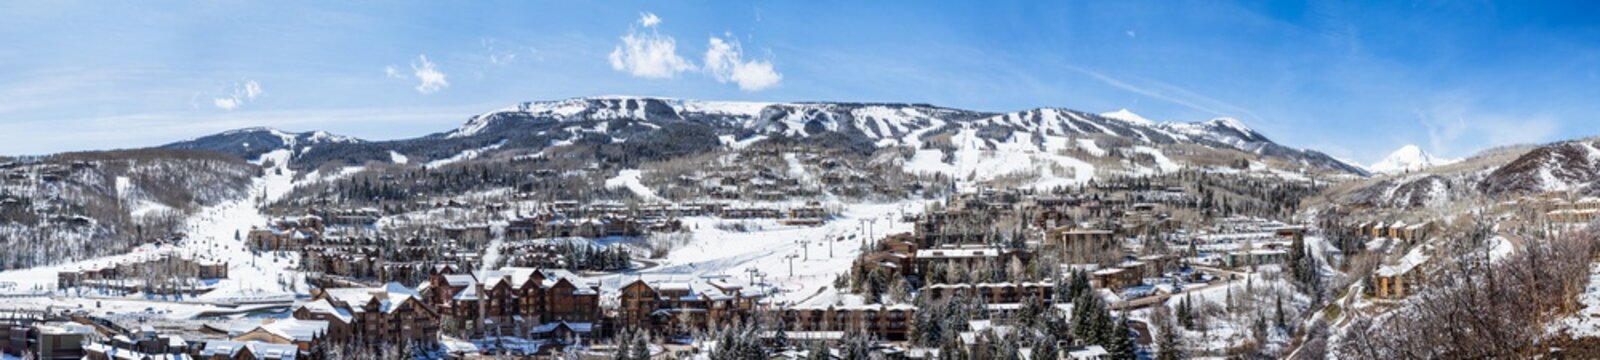 Panorama of Snowmass Mountain ski area in Aspen, Colorado.